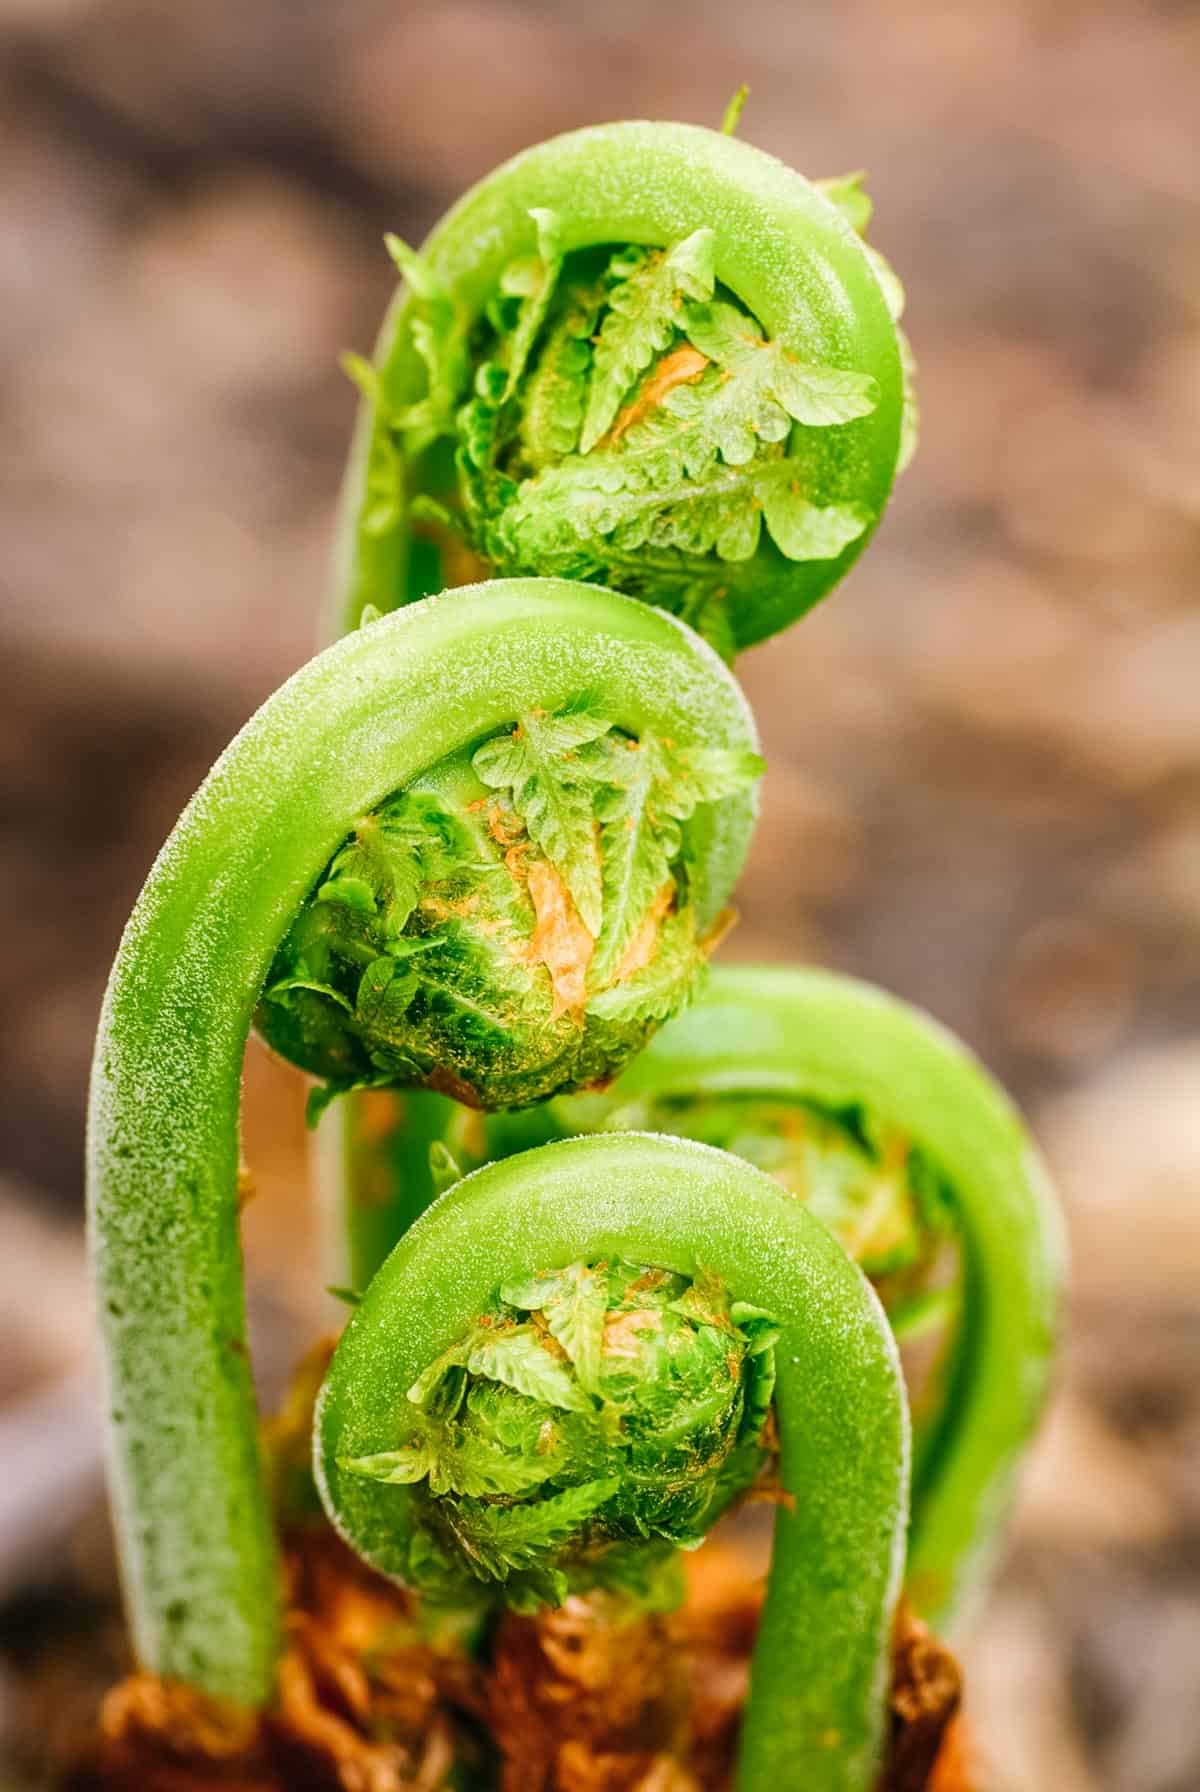 fiddlehead ferns growing